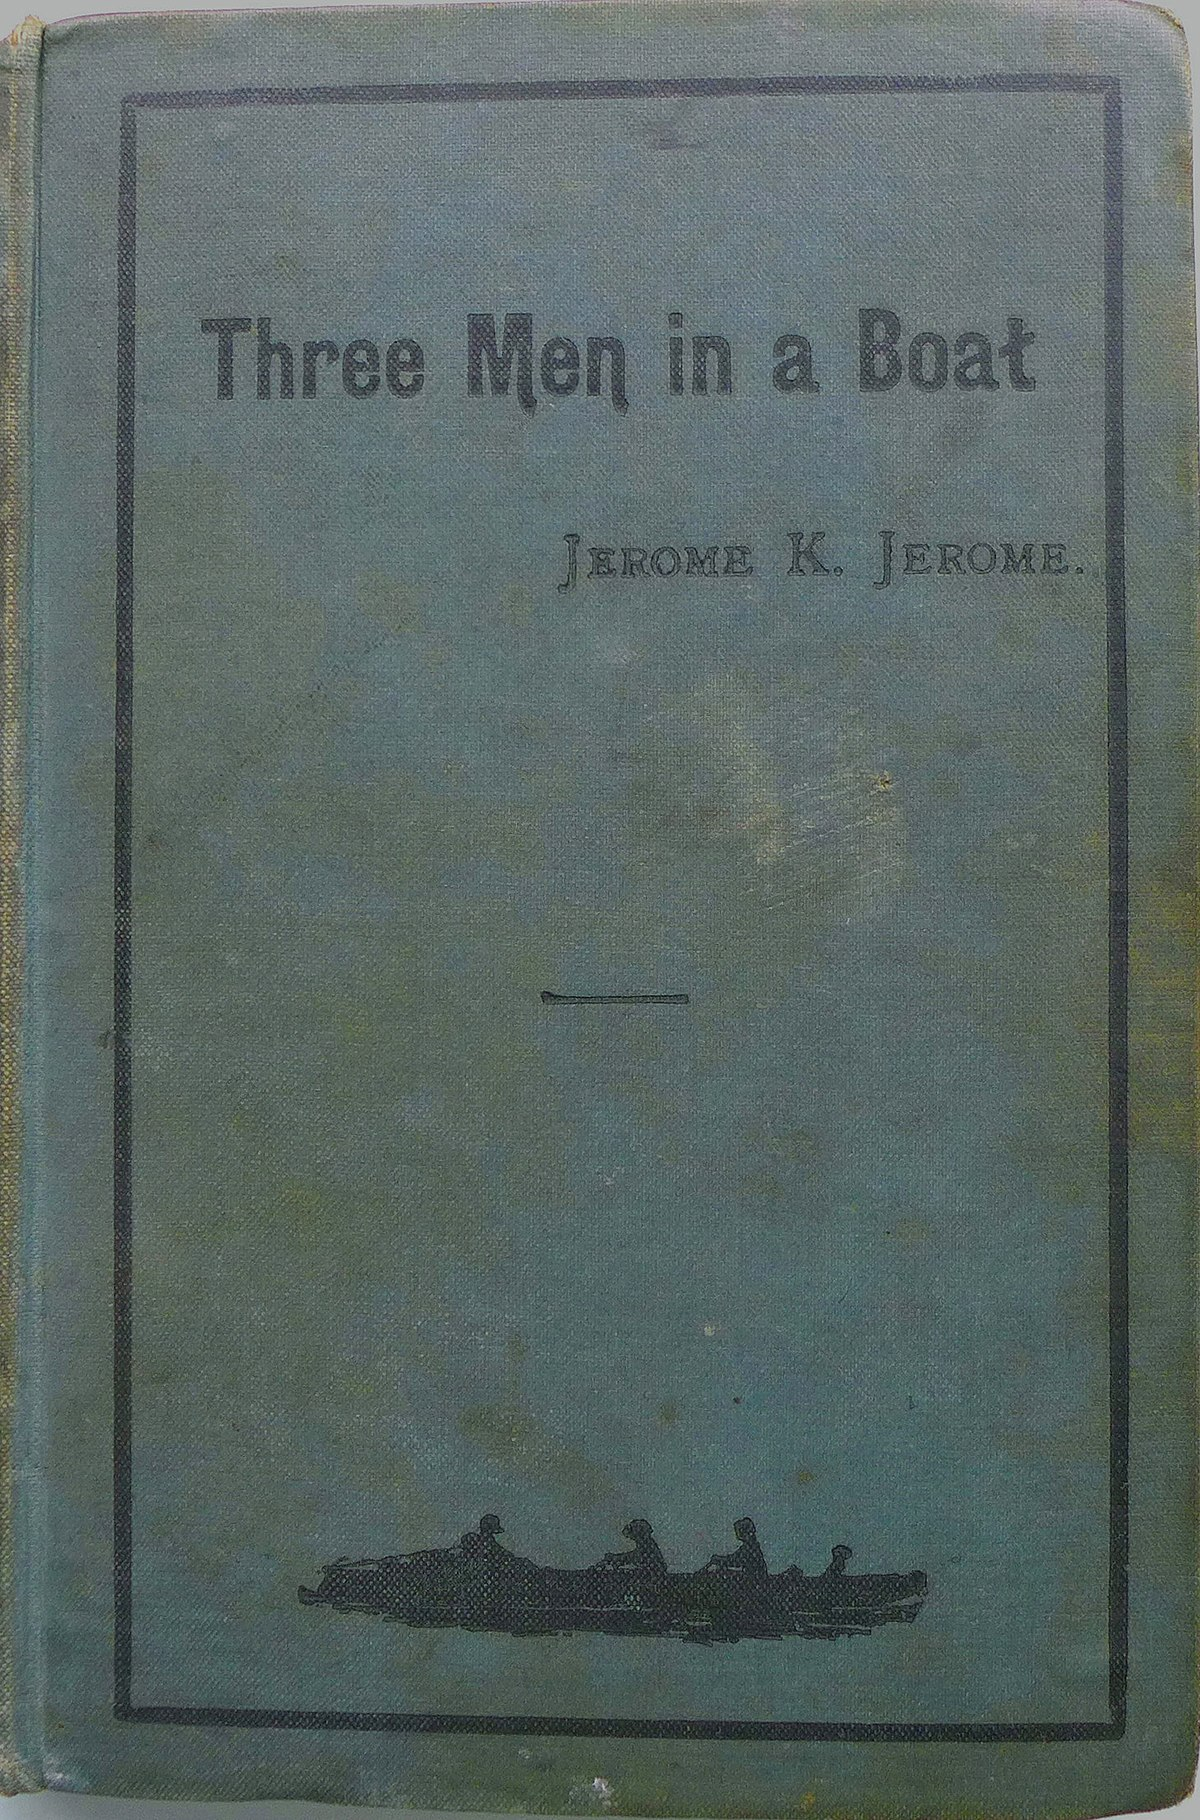 Three Men in a Boat - Wikipedia